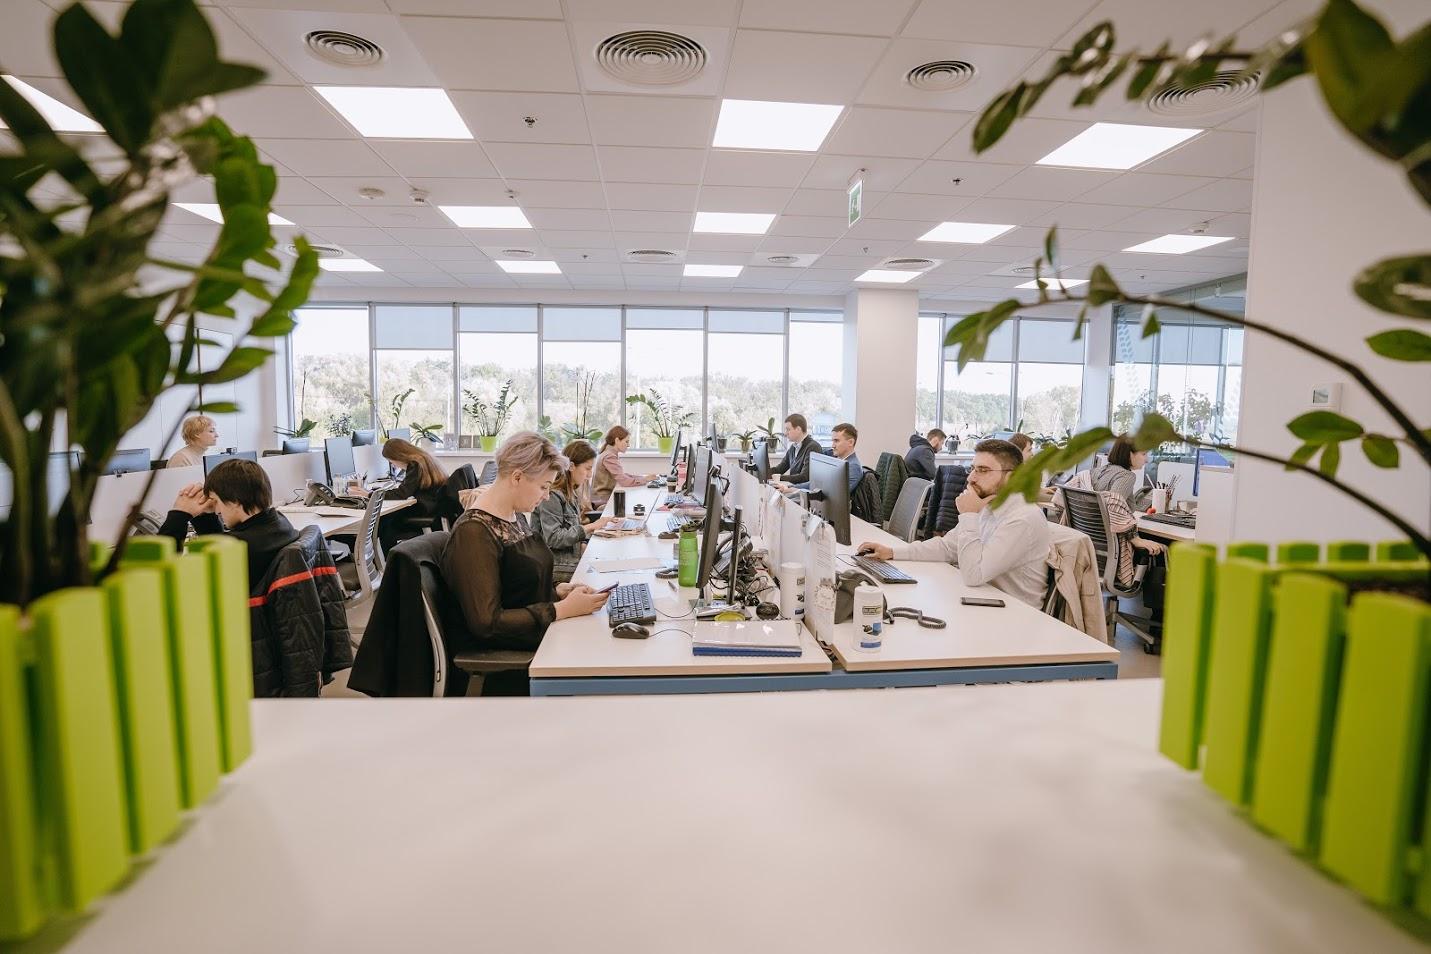 office.JPG (221 KB)